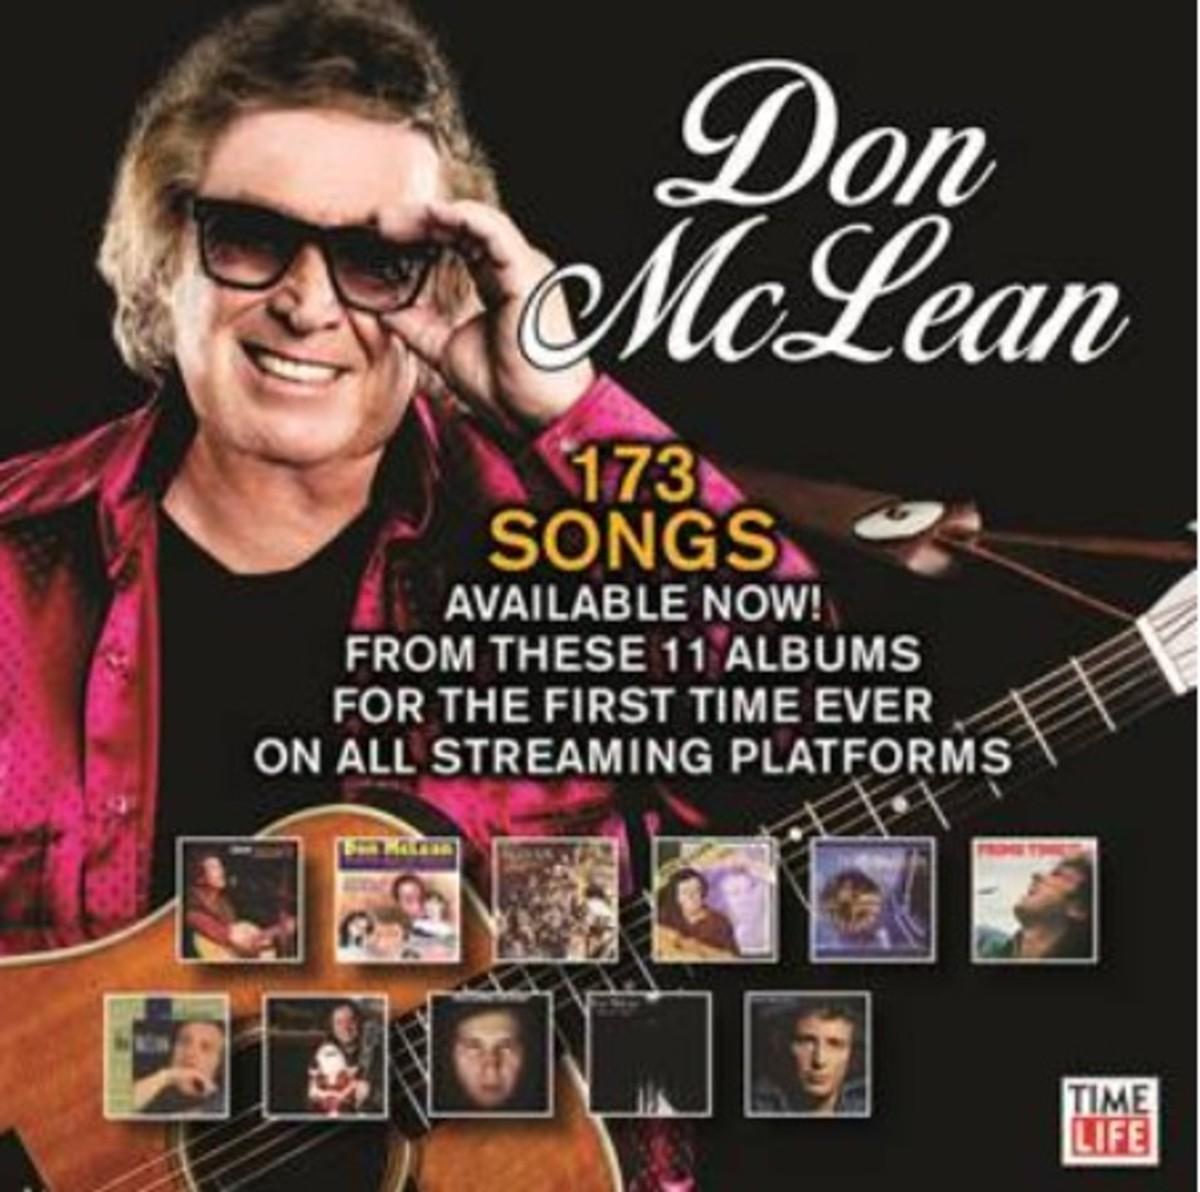 Don McLean 173